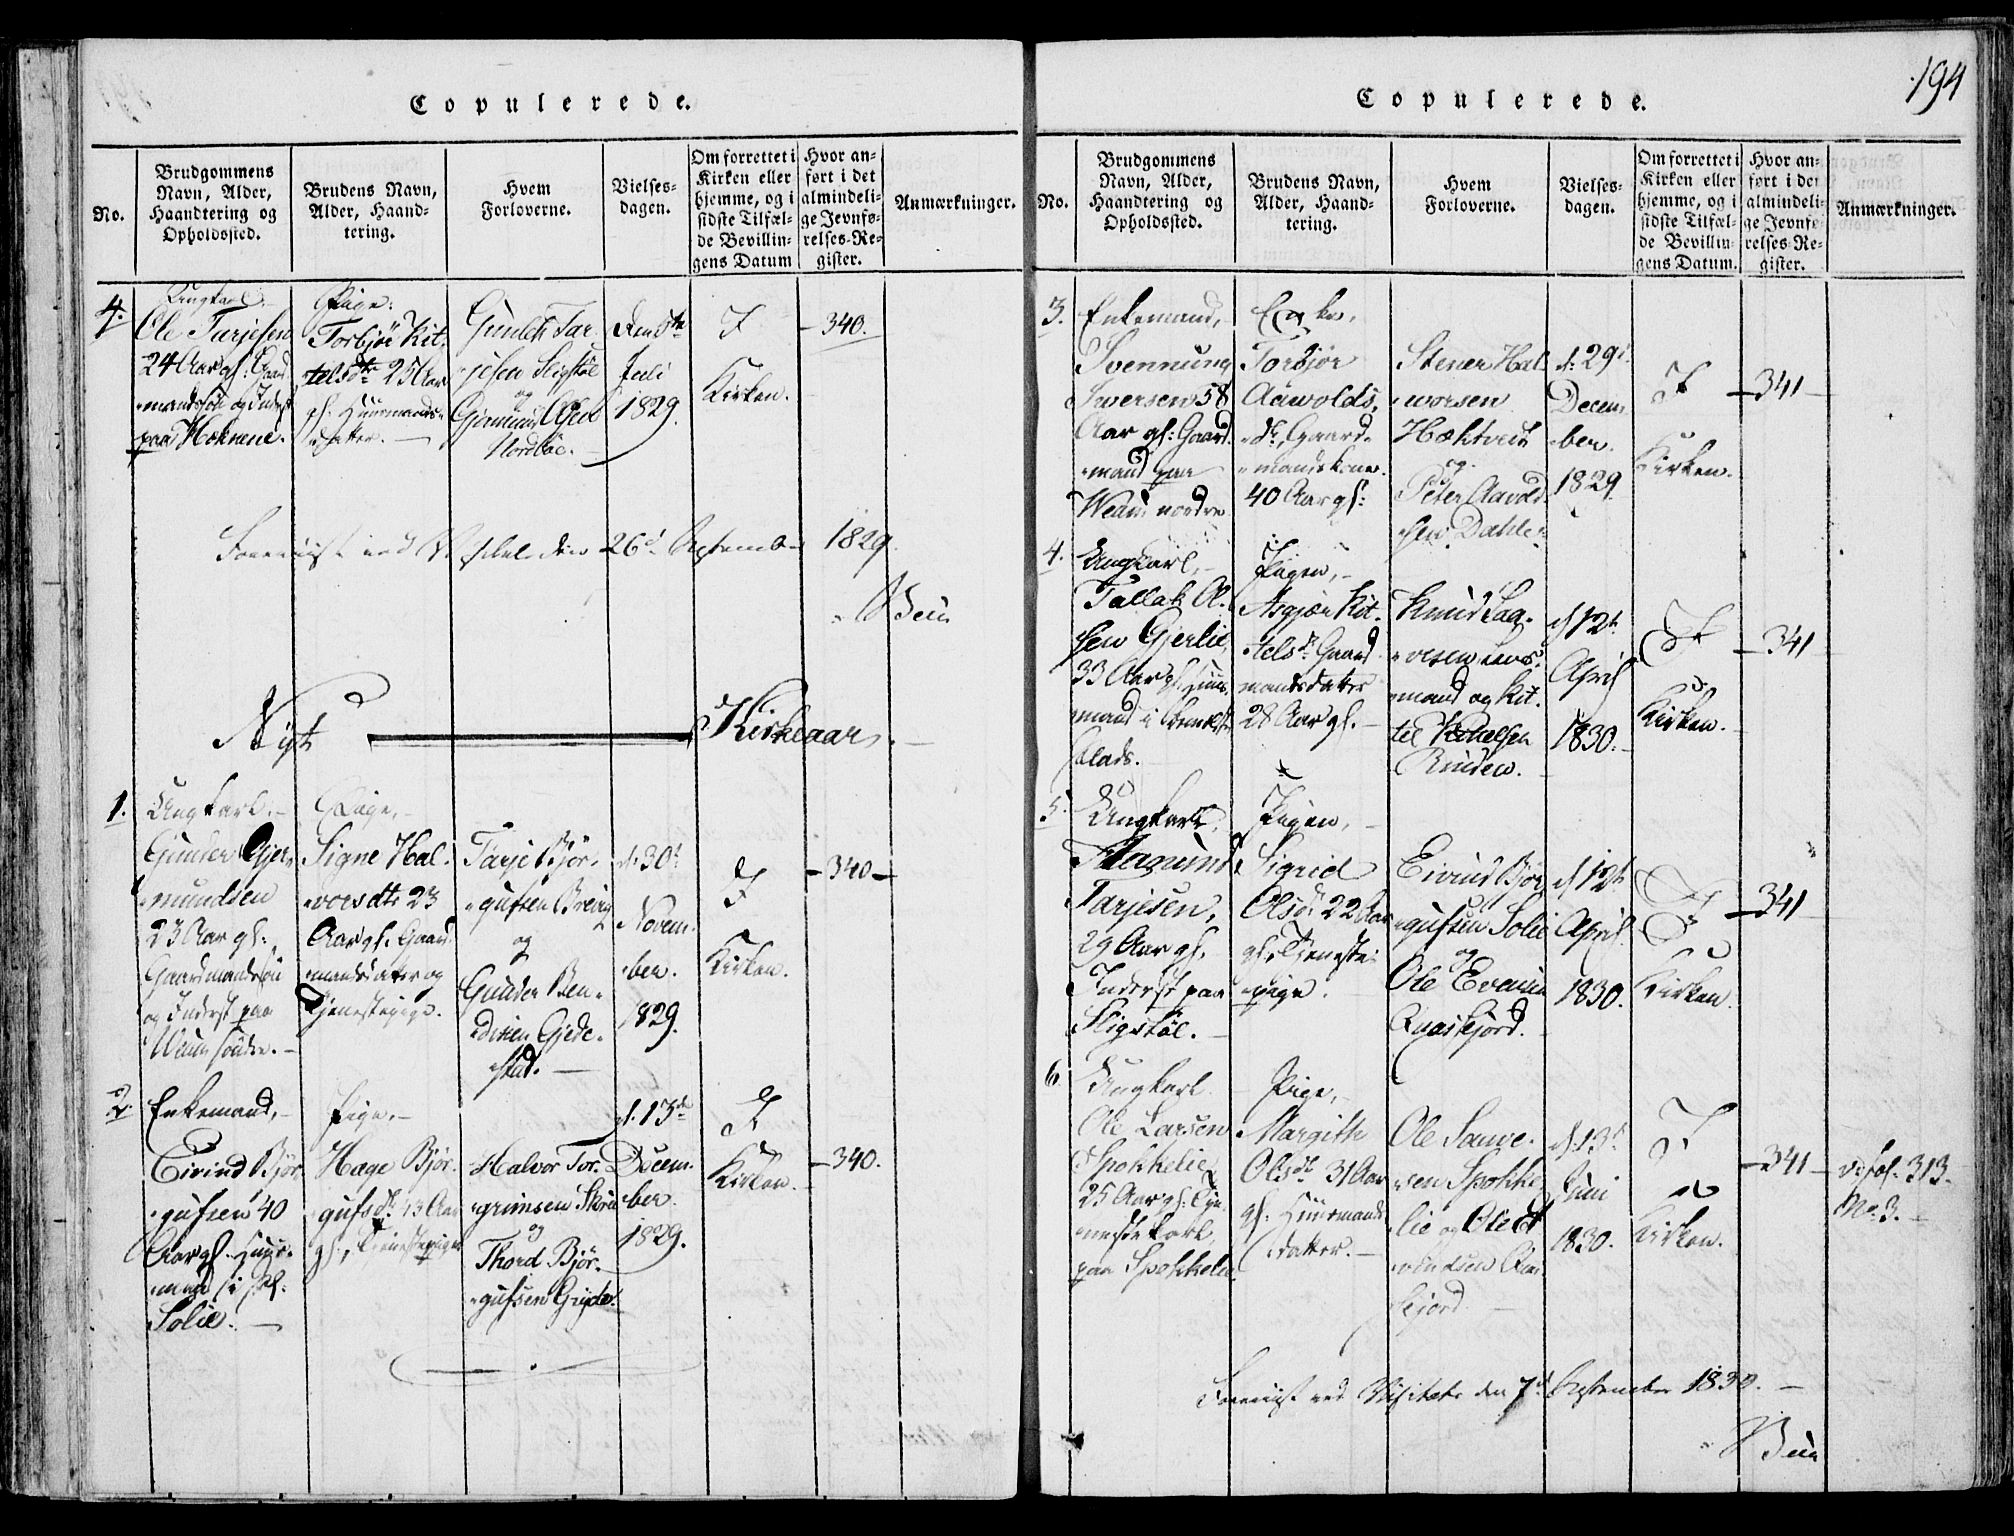 SAKO, Fyresdal kirkebøker, F/Fb/L0001: Ministerialbok nr. II 1, 1815-1854, s. 194